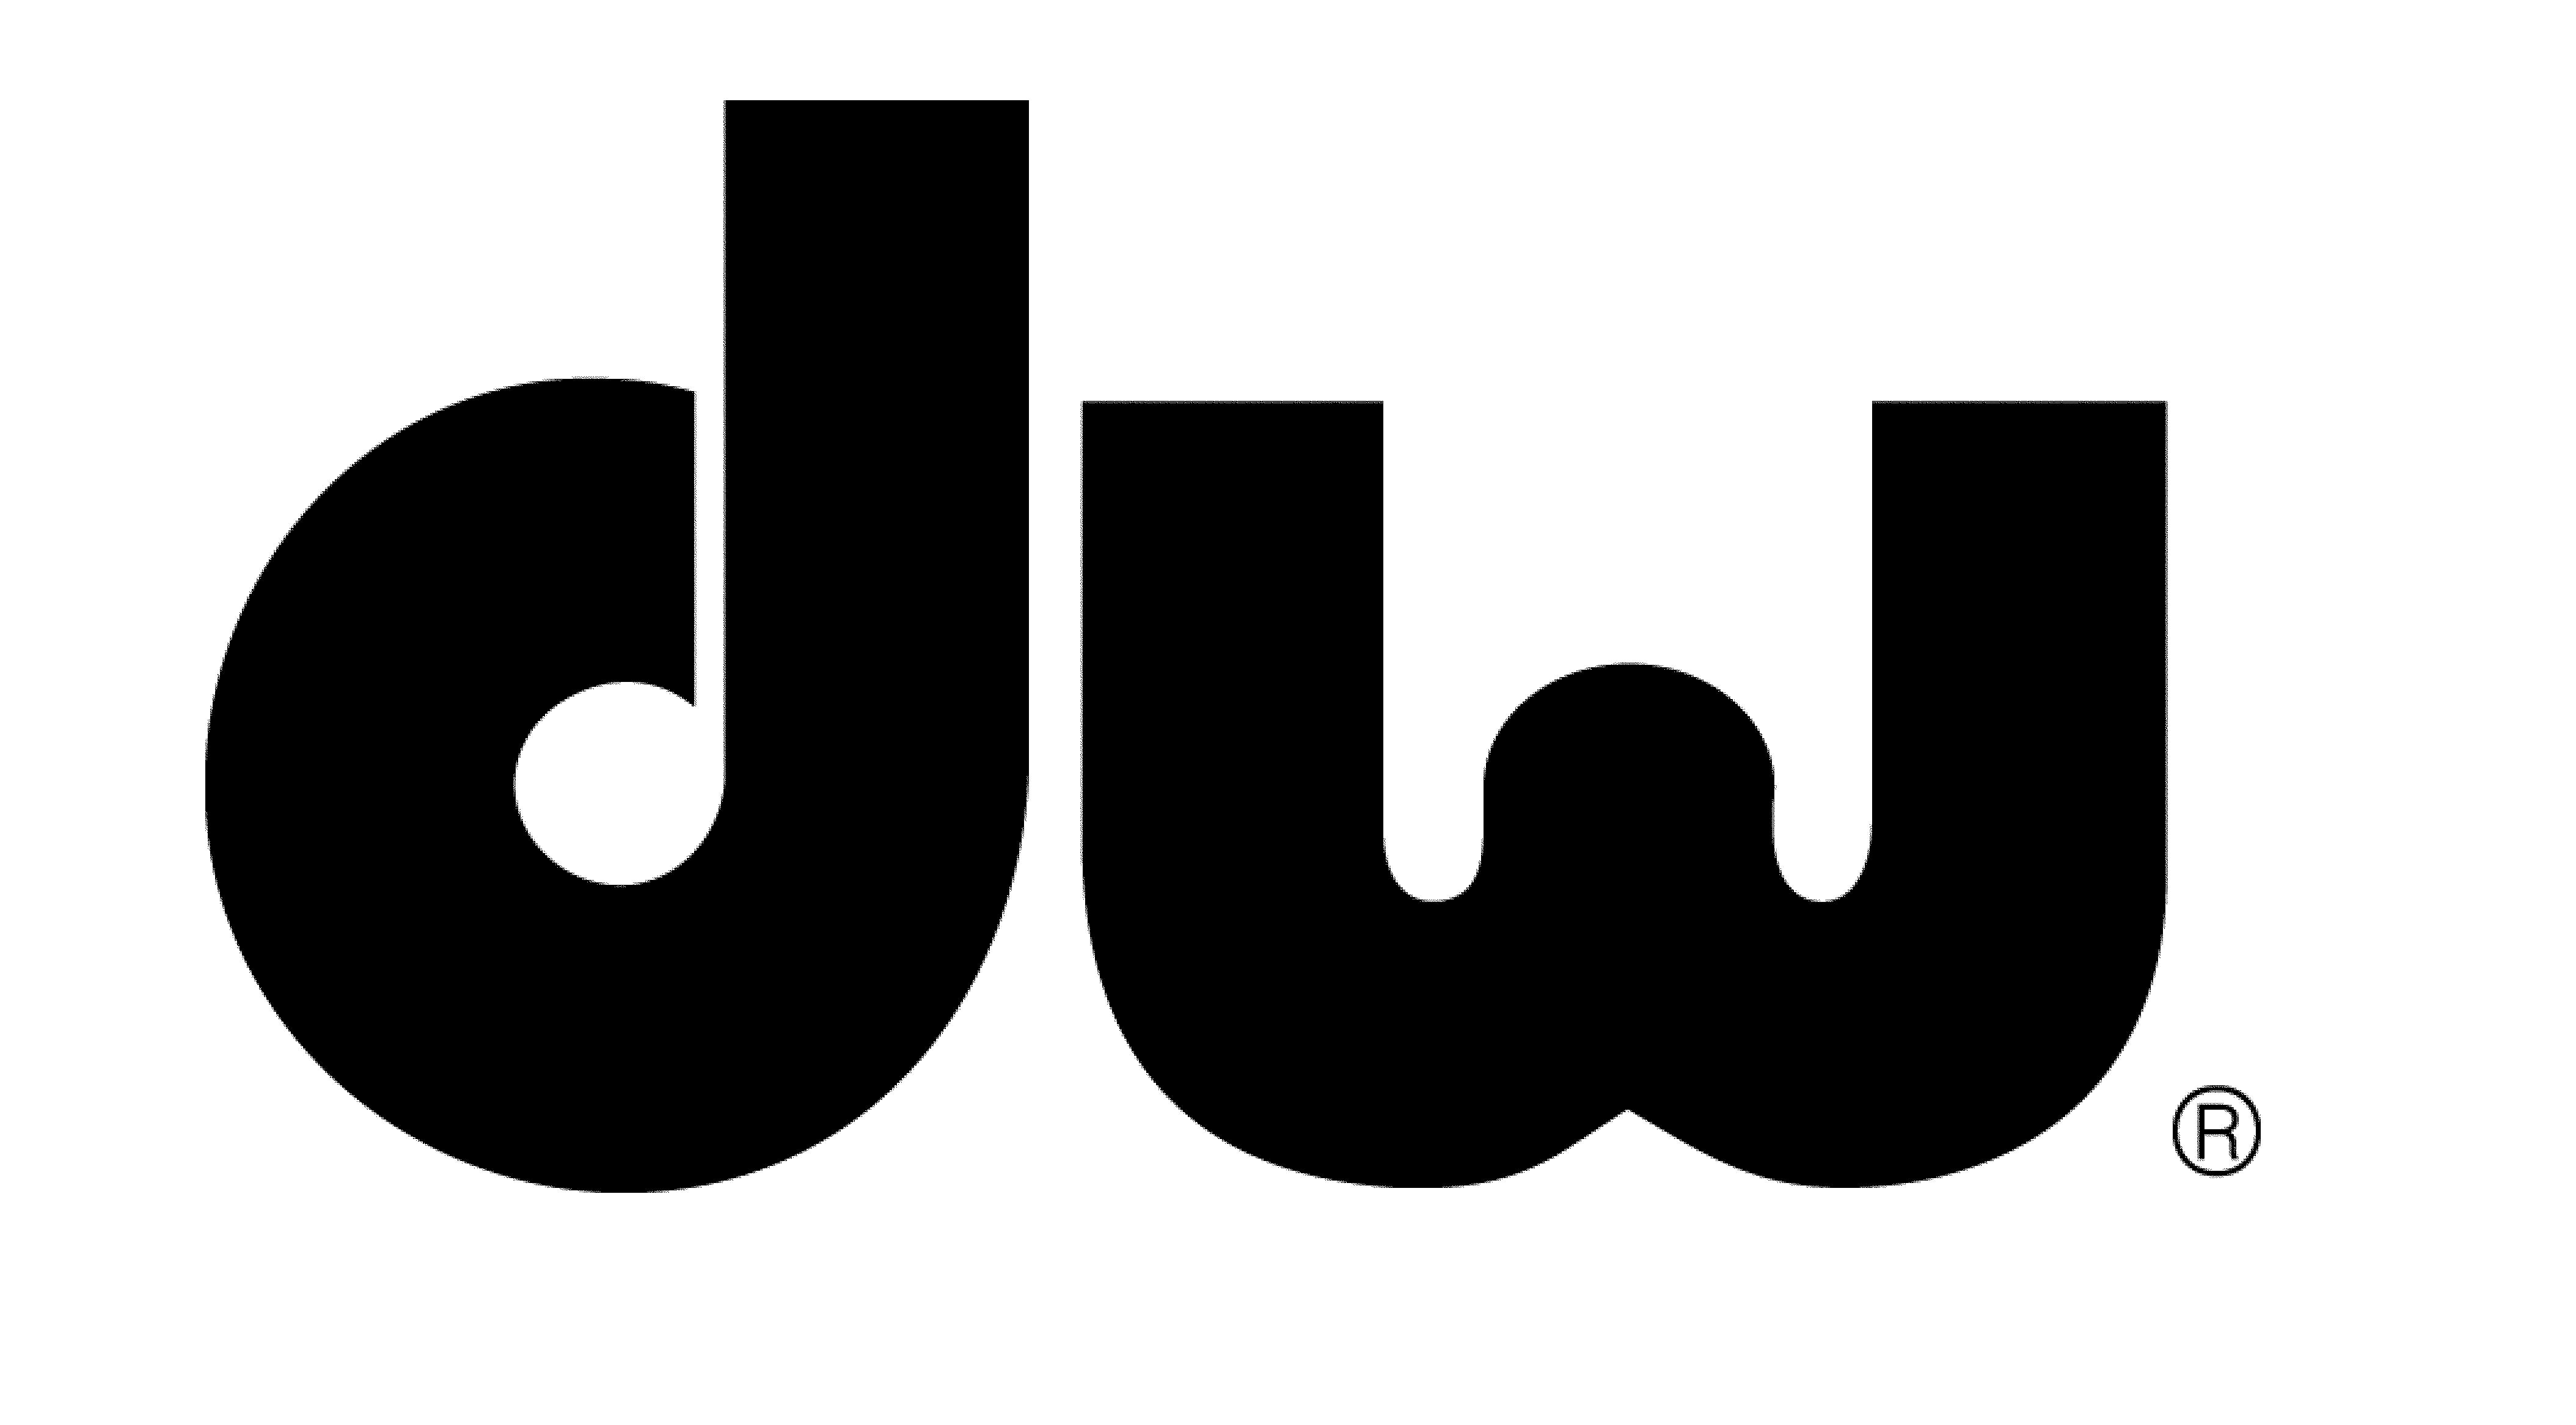 Dw Logos.